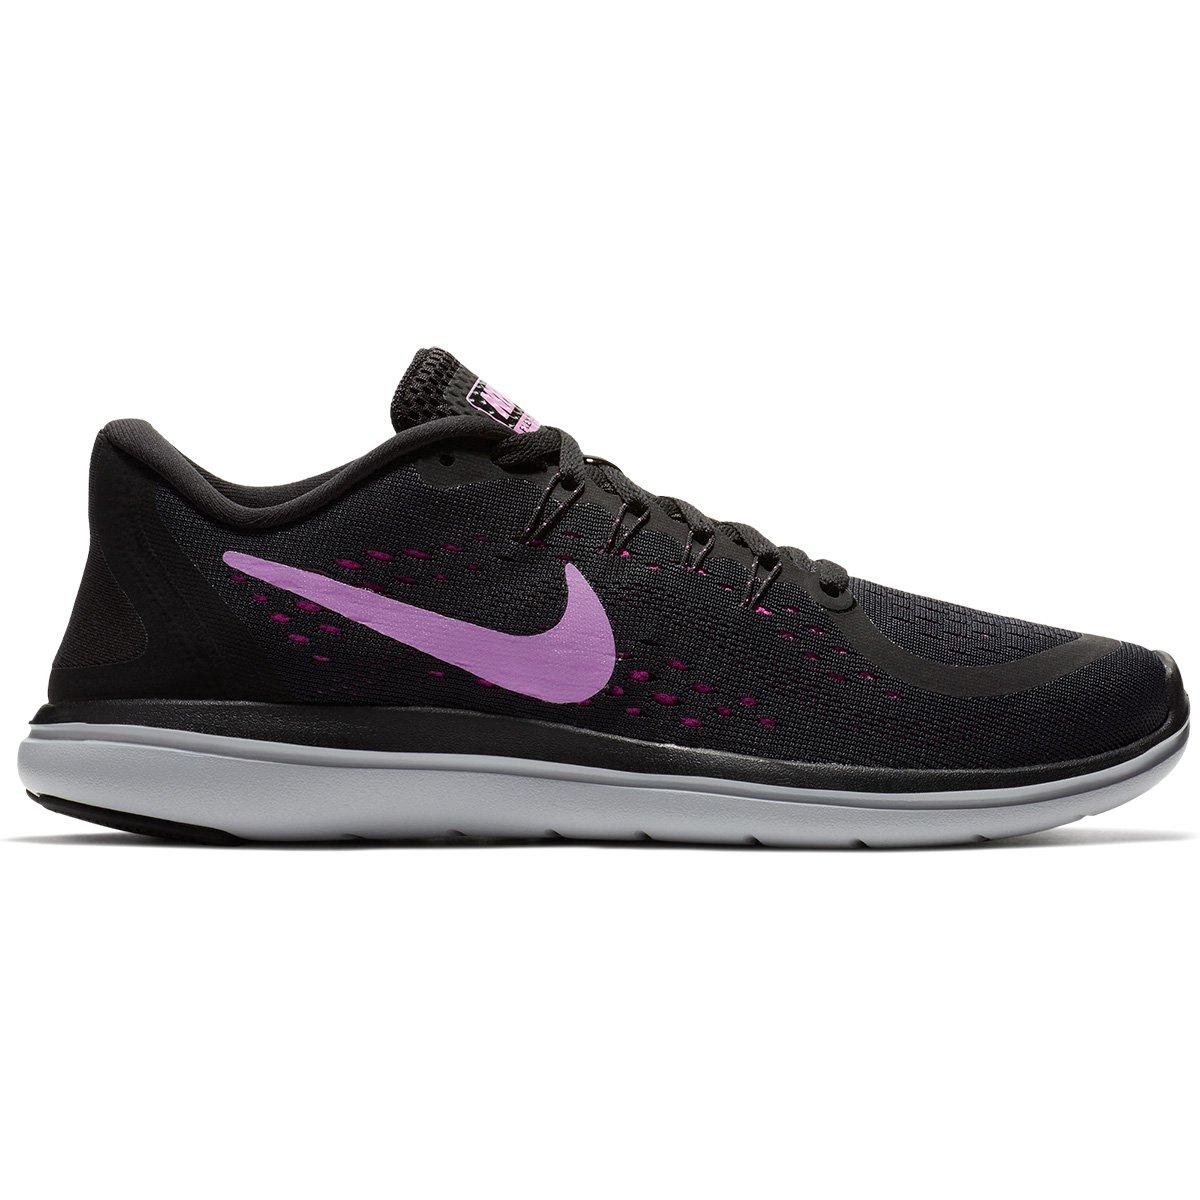 Tênis Nike Flex 2017 Rn Feminino Preto E Lilás